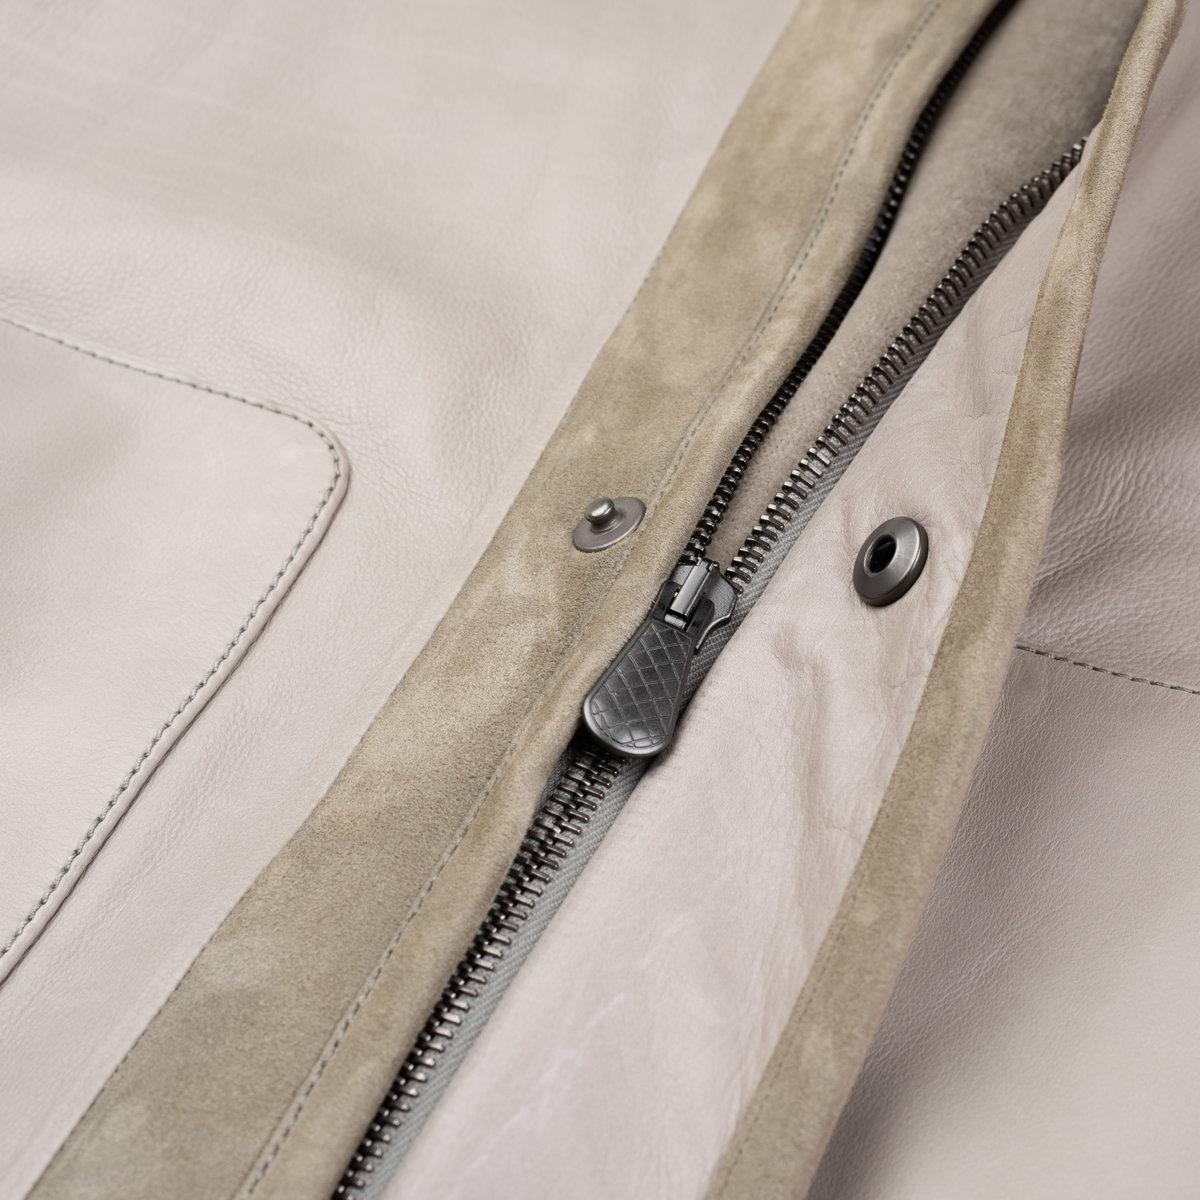 BOTTEGA VENETA Gray Taurus Leather Bomber Jacket with Velvet Cotton Lining 50 US M2.jpg